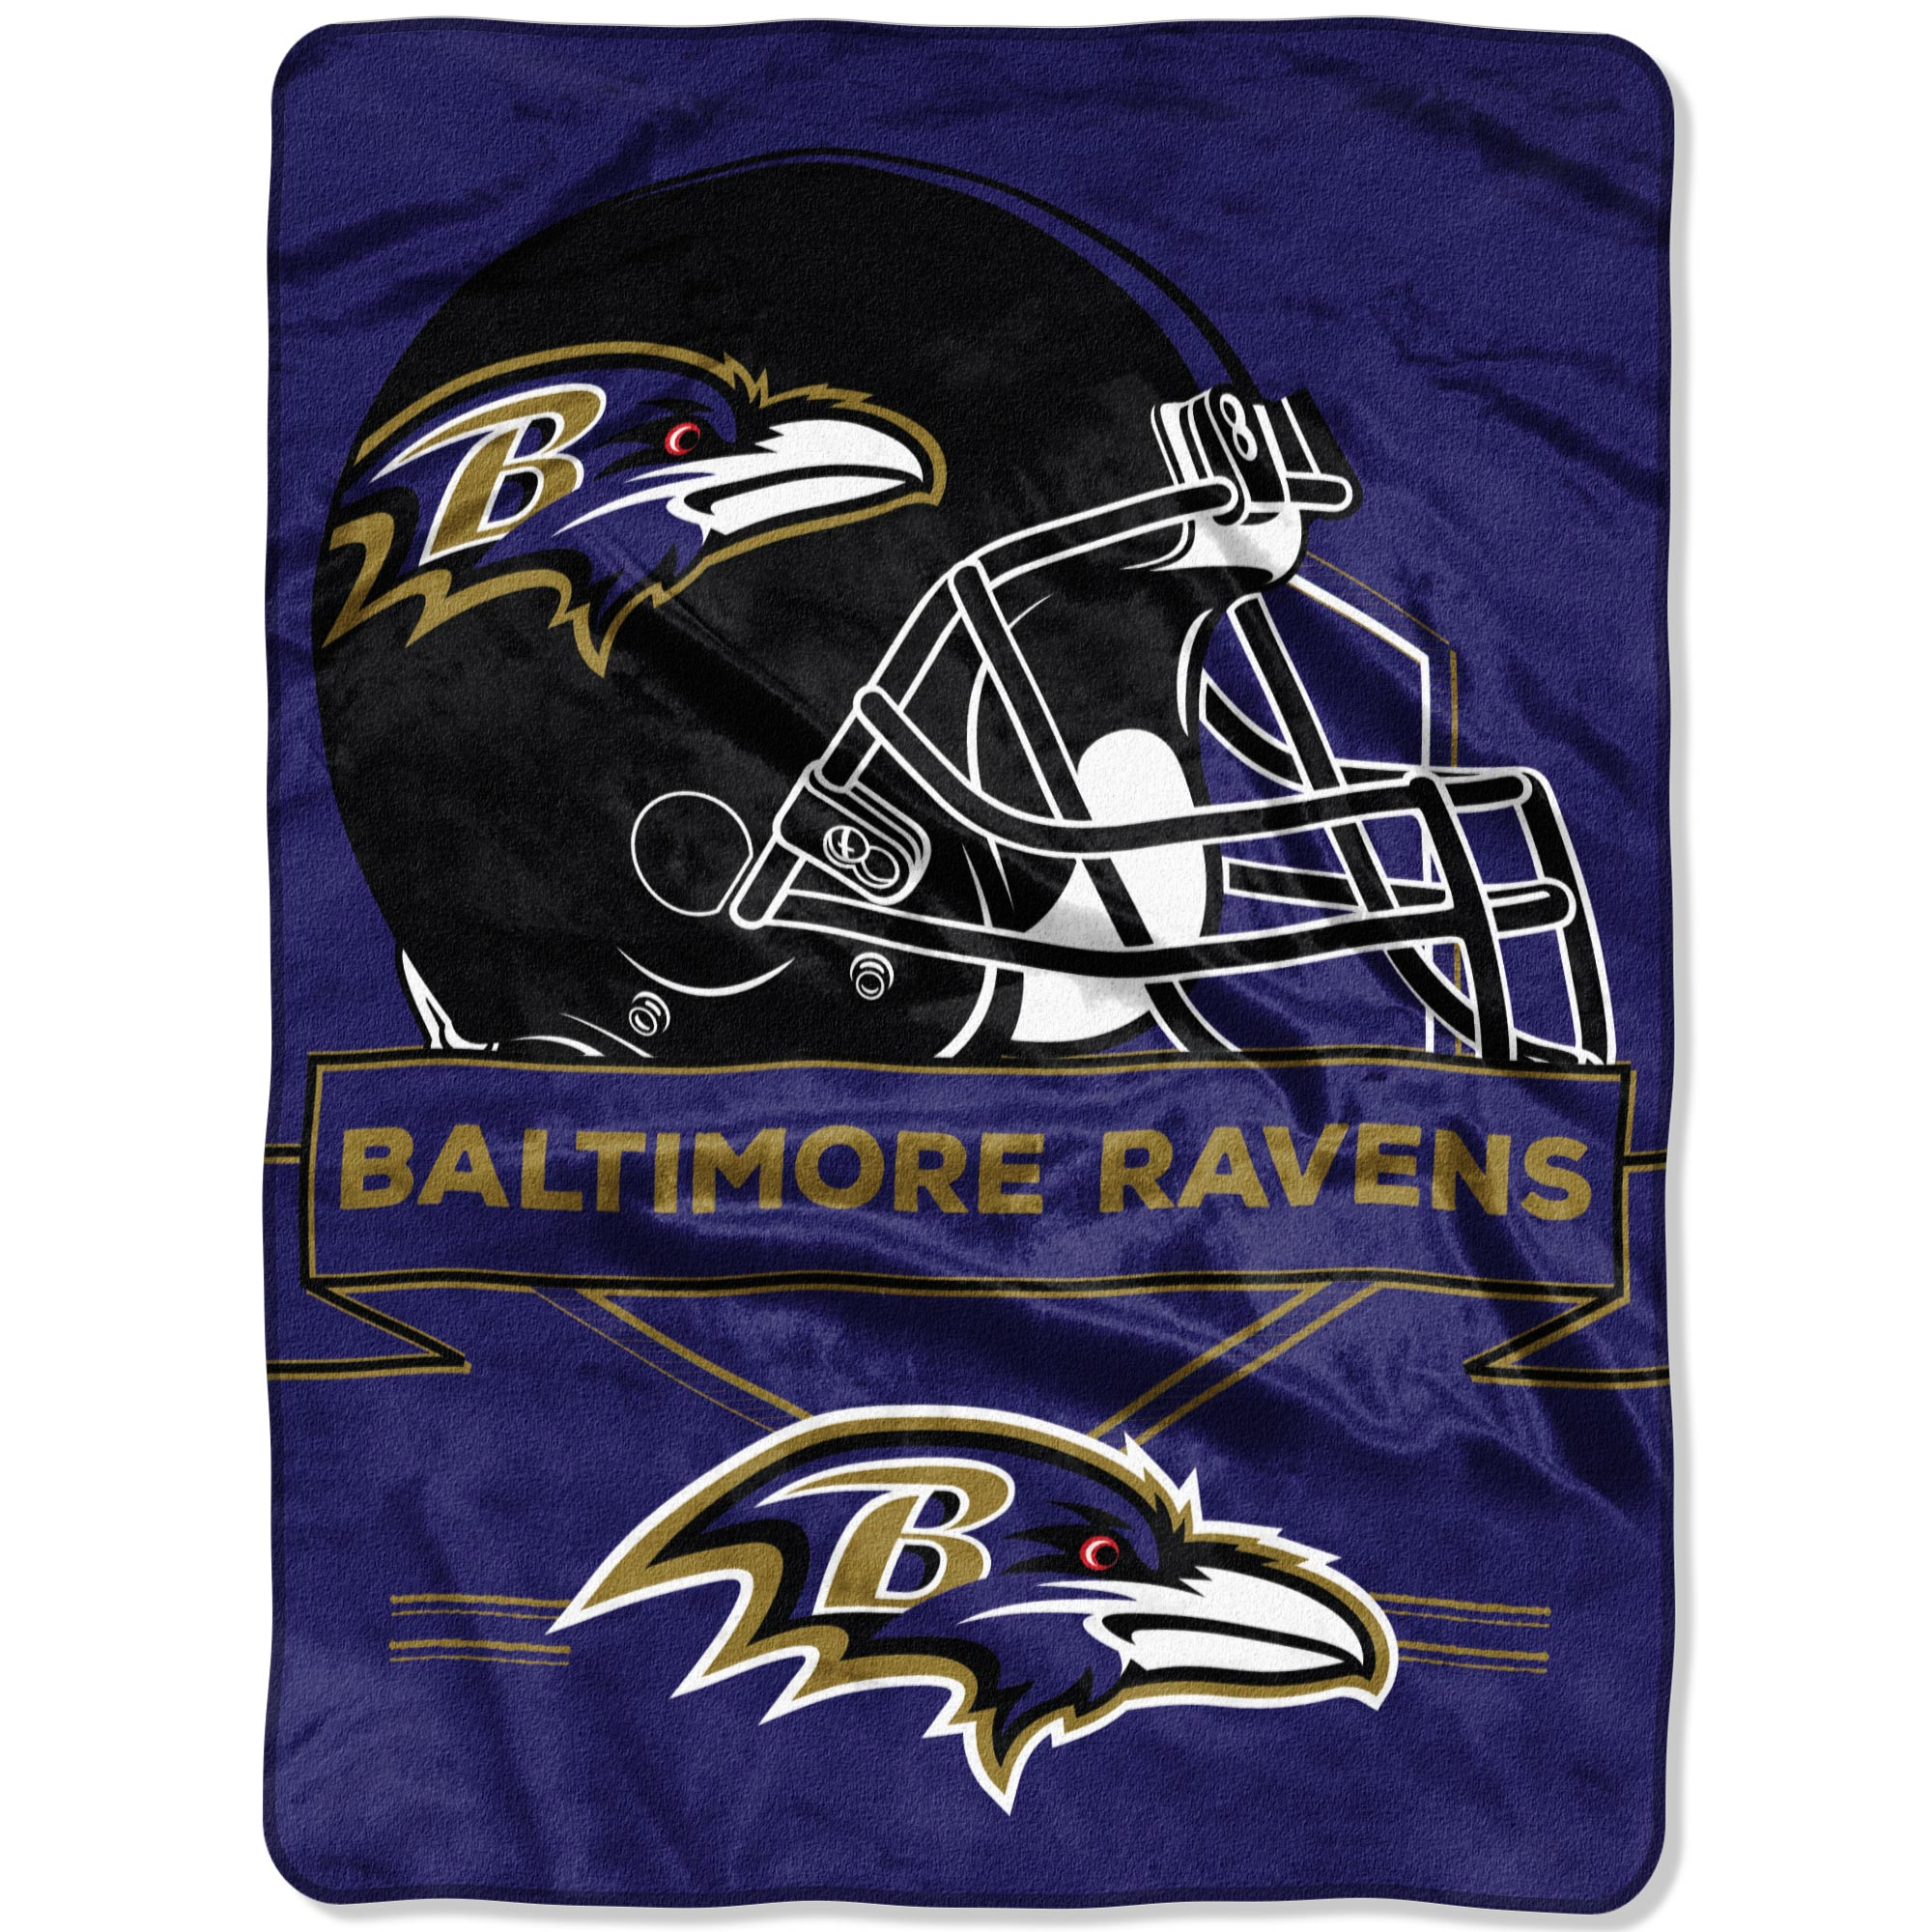 "Baltimore Ravens The Northwest Company 60"" x 80"" Prestige Raschel Blanket - No Size"